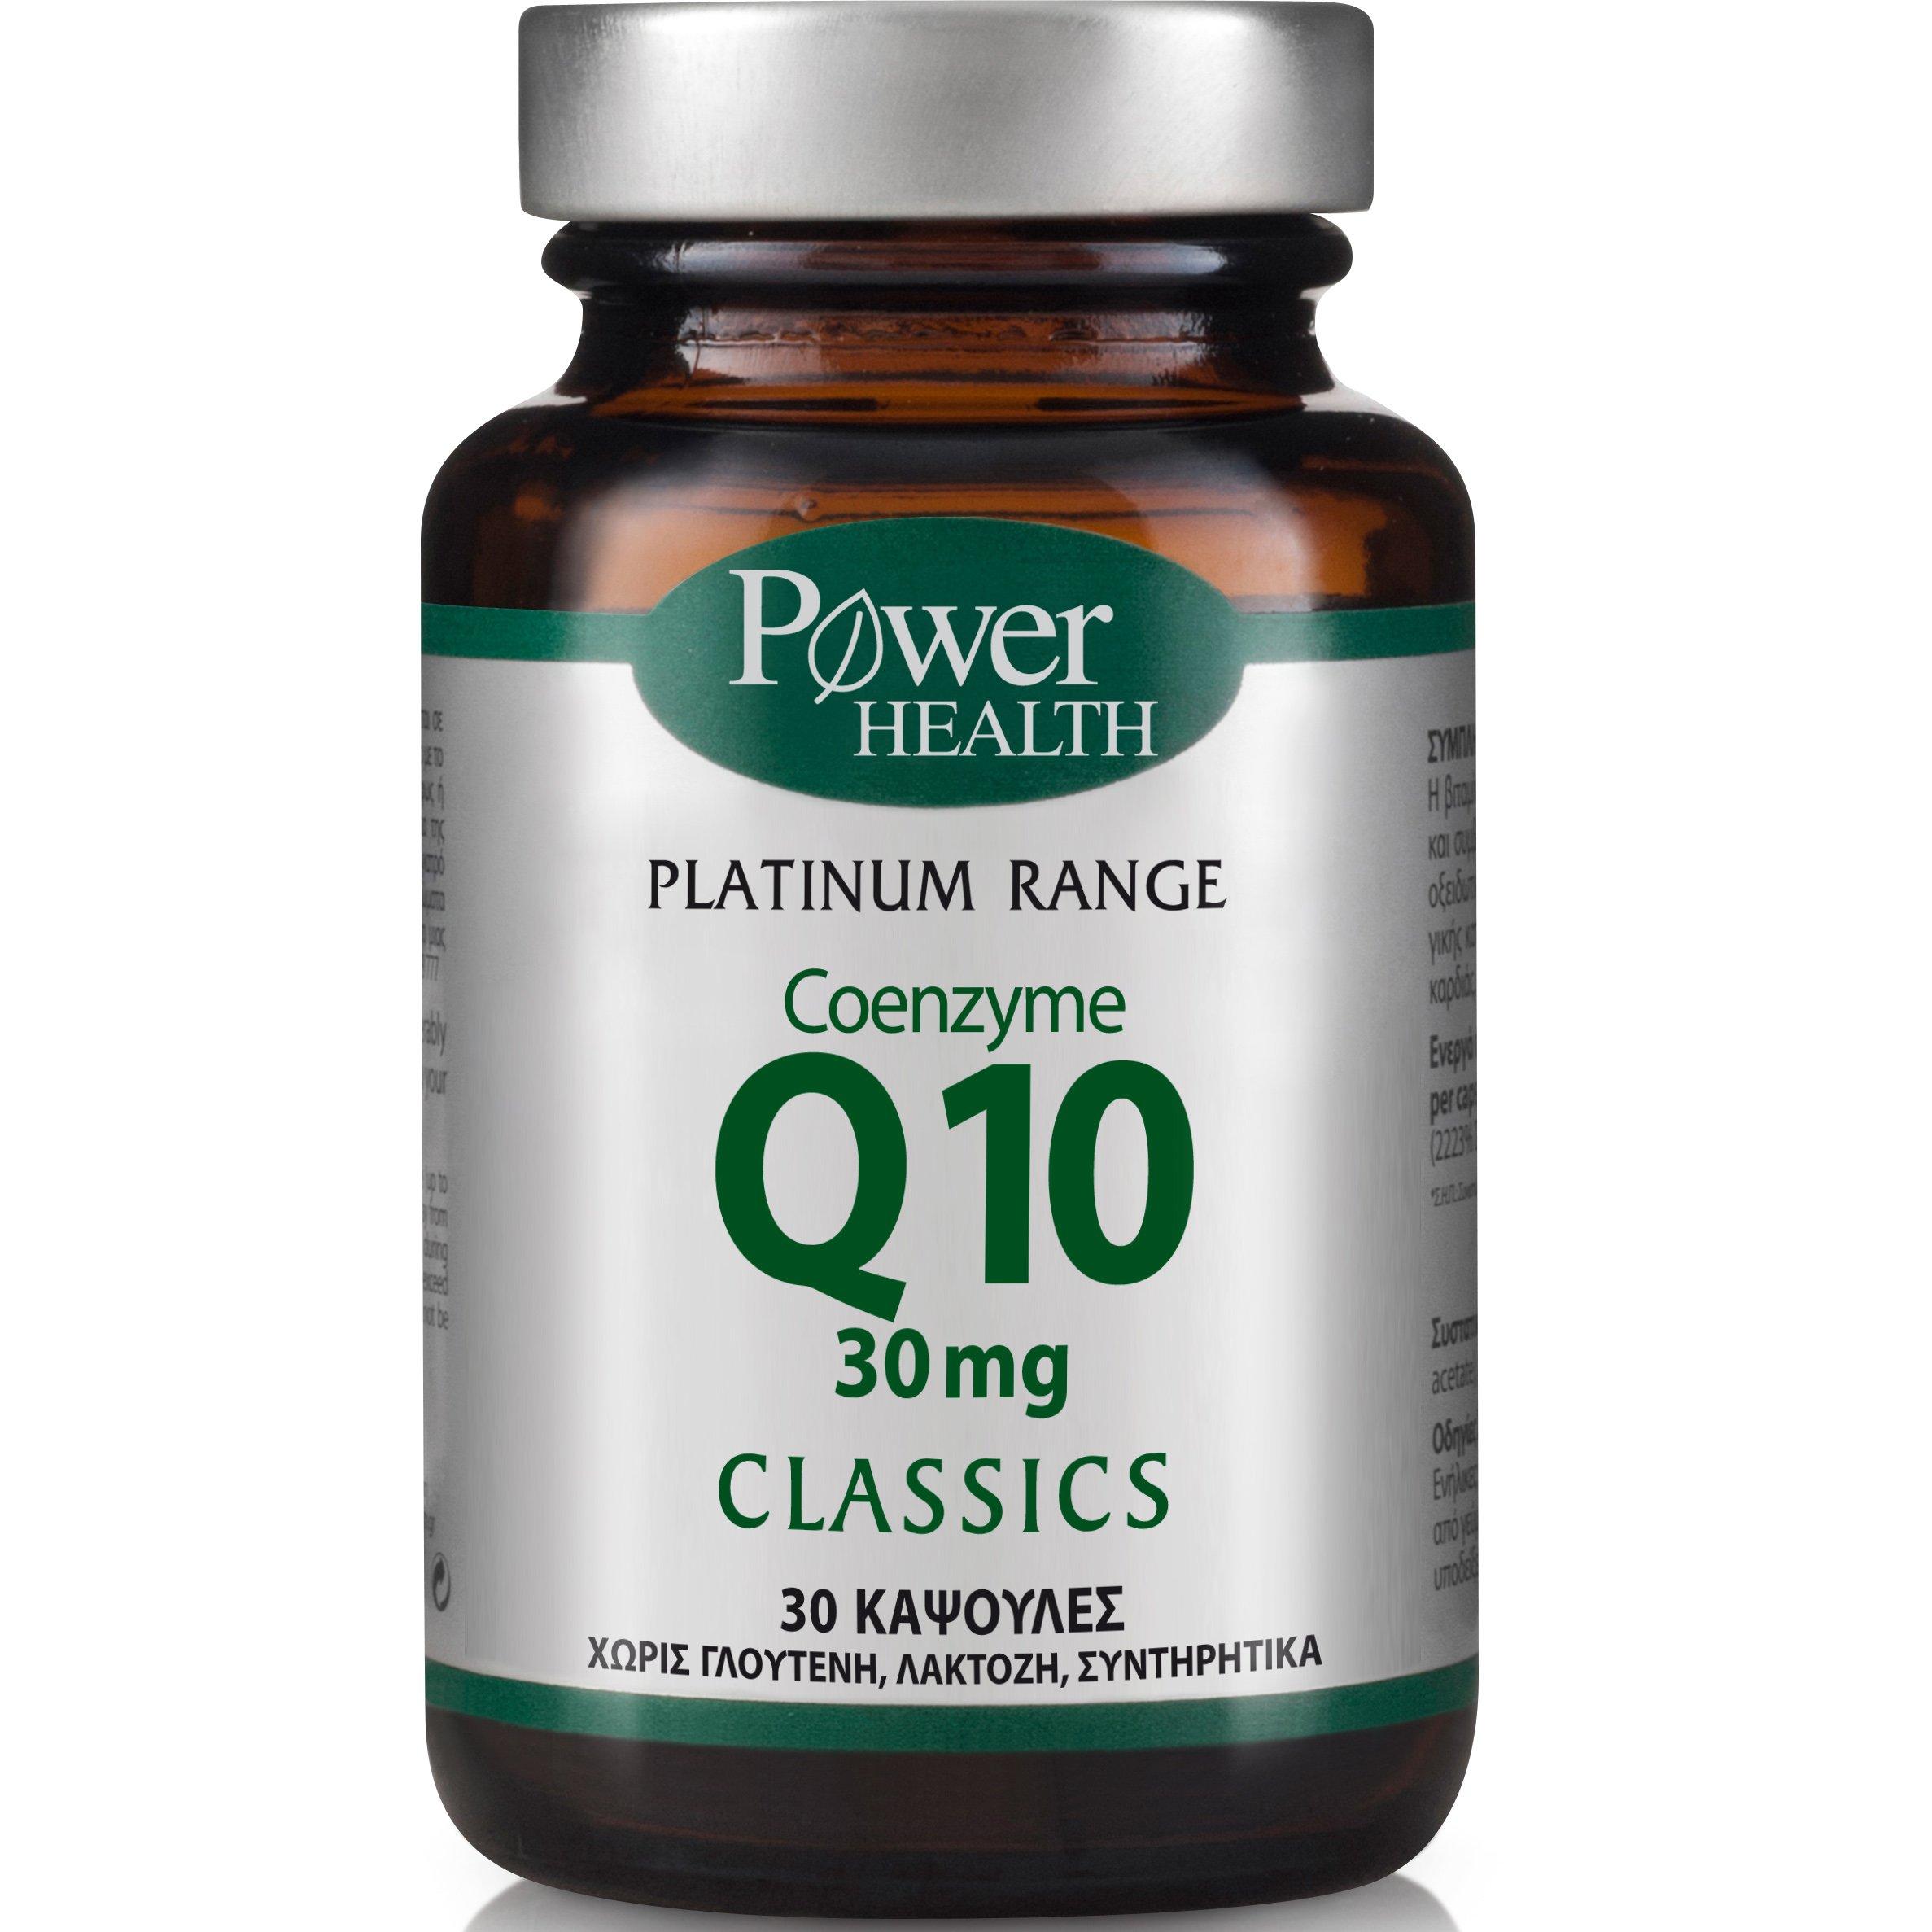 Power Health PlatinumCoenzyme Q10 30mg Συμπλήρωμα Διατροφής για την Παραγωγή Ενέργειας30caps